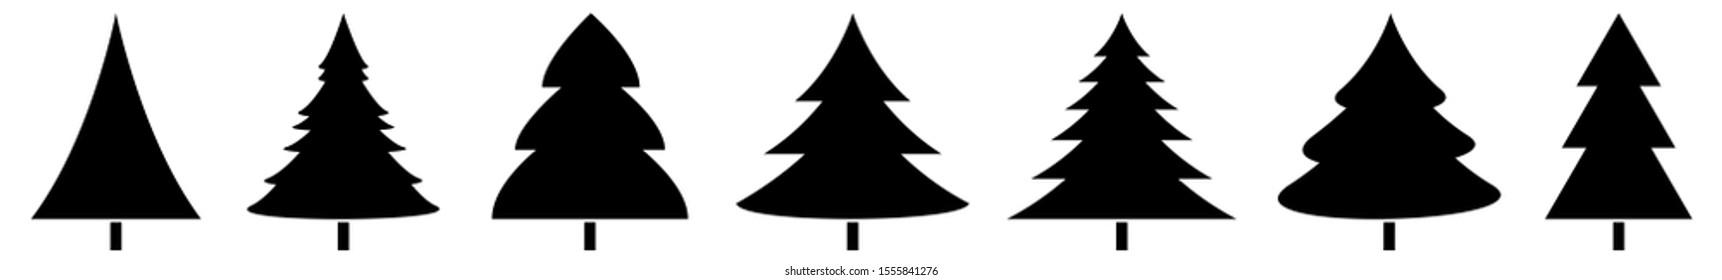 Christmas Tree Black Icon Fir Illustration Symbol Isolated Variations